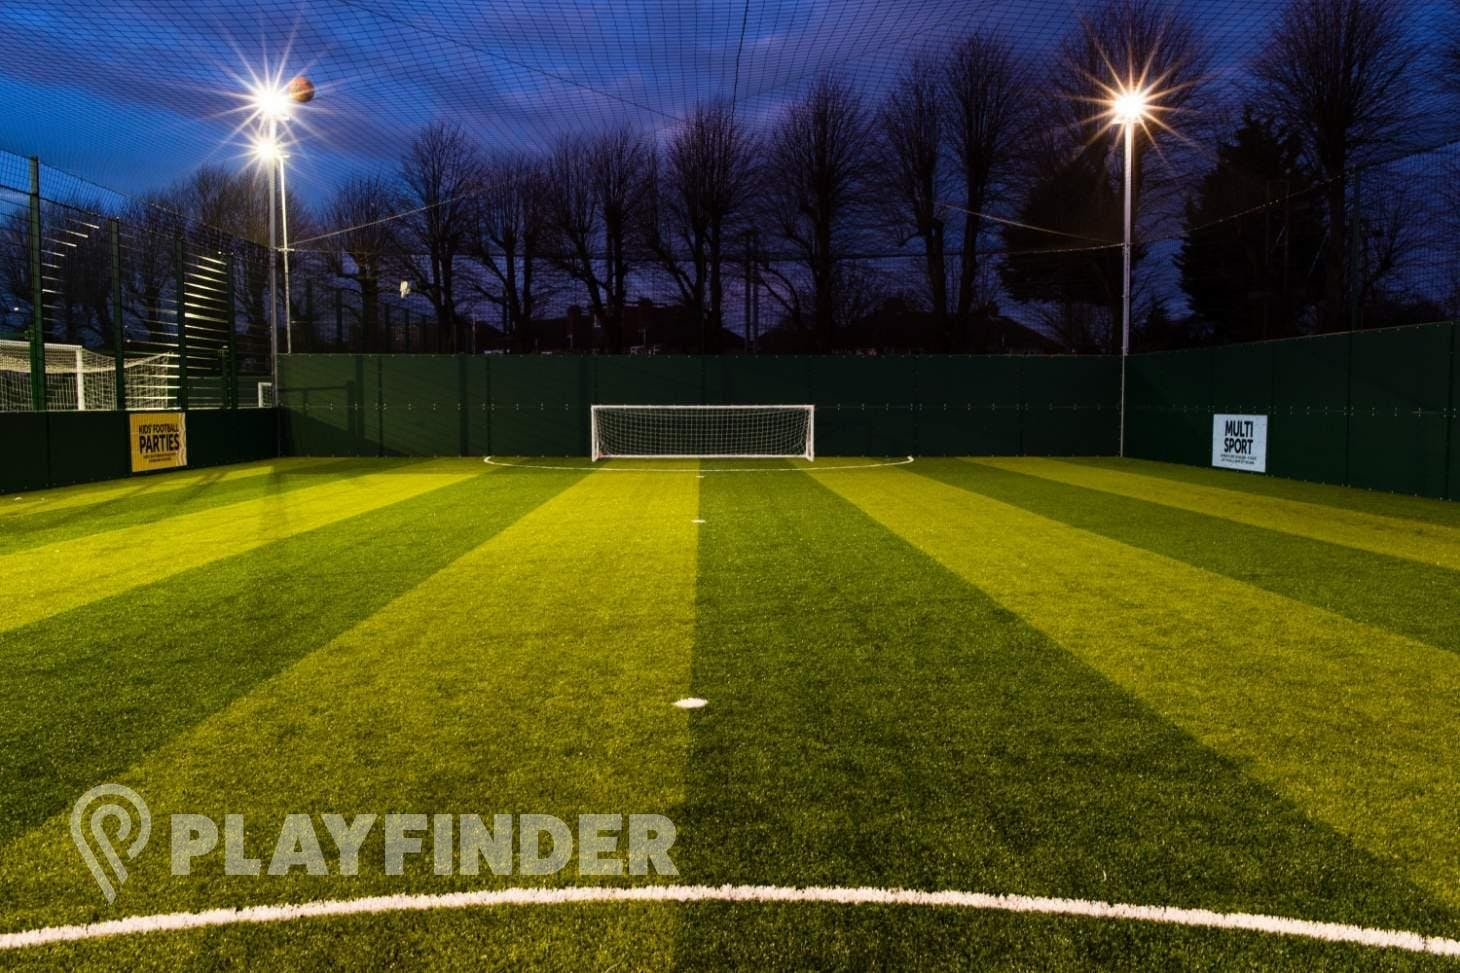 Powerleague Enfield 7 a side | 3G Astroturf football pitch